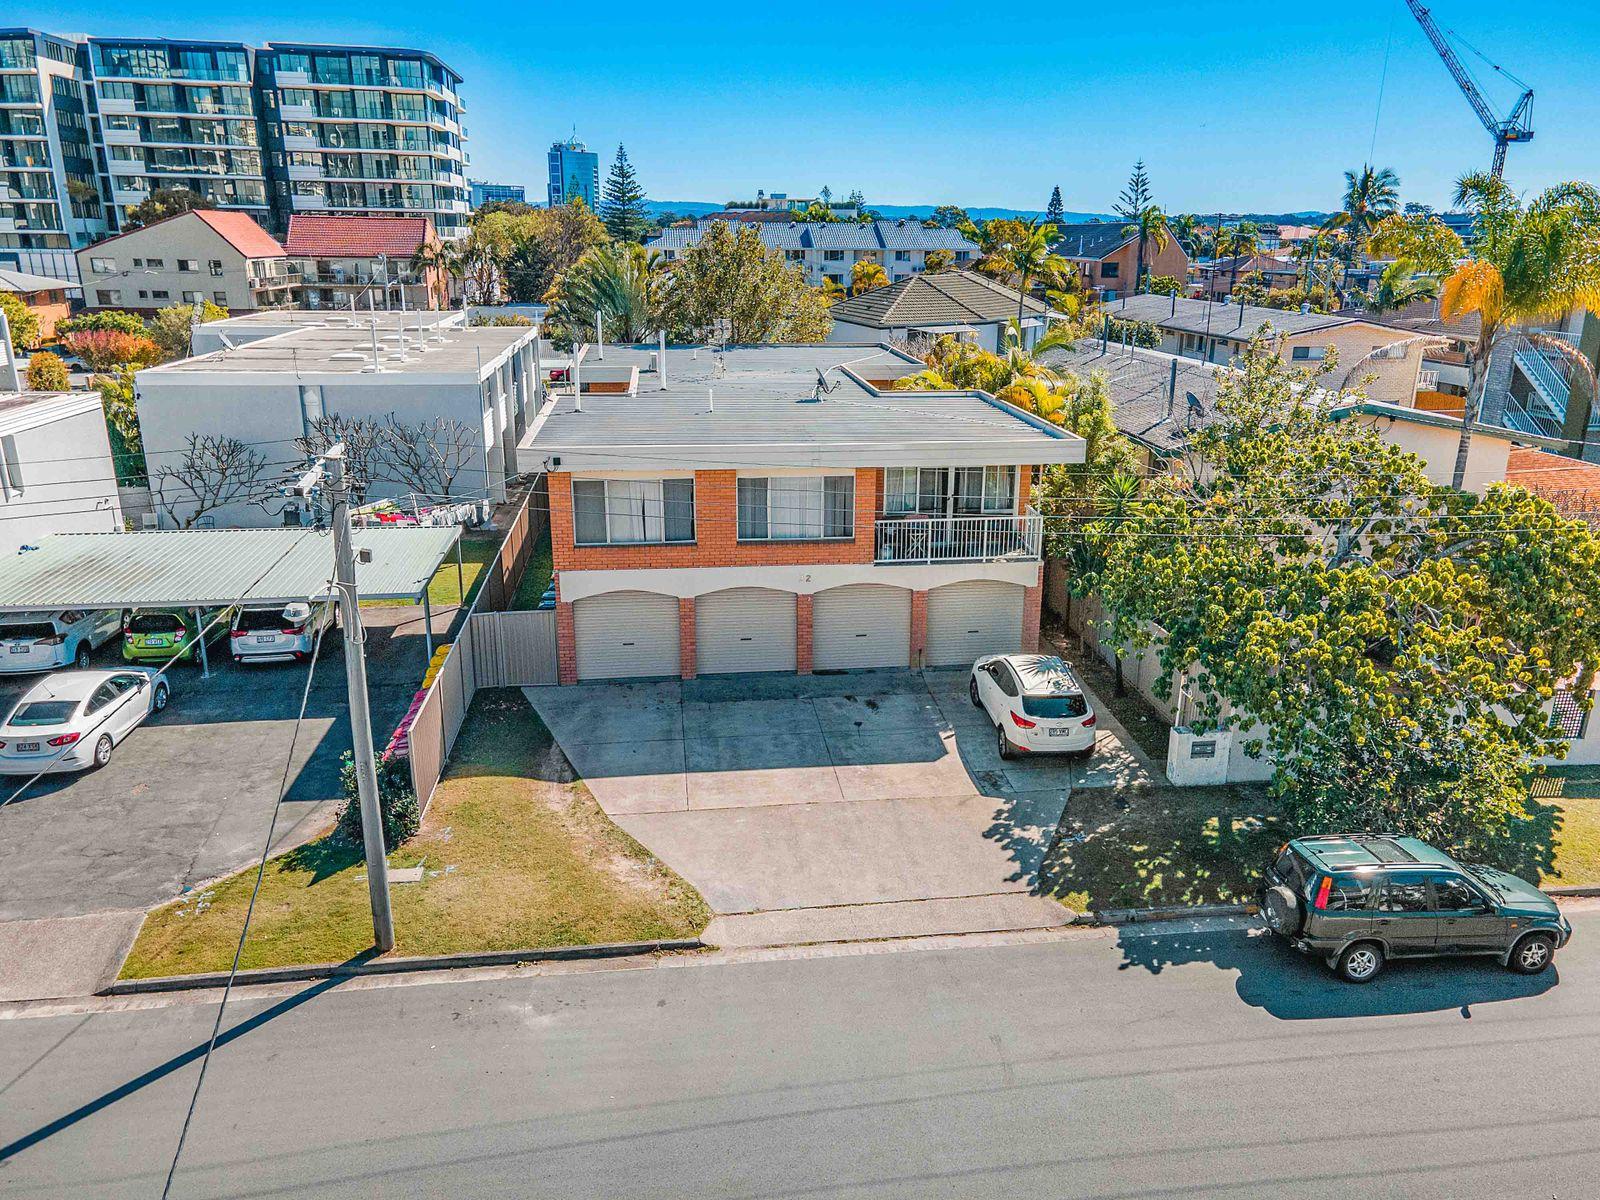 2/22 Darrambal Street, Chevron Island, QLD 4217